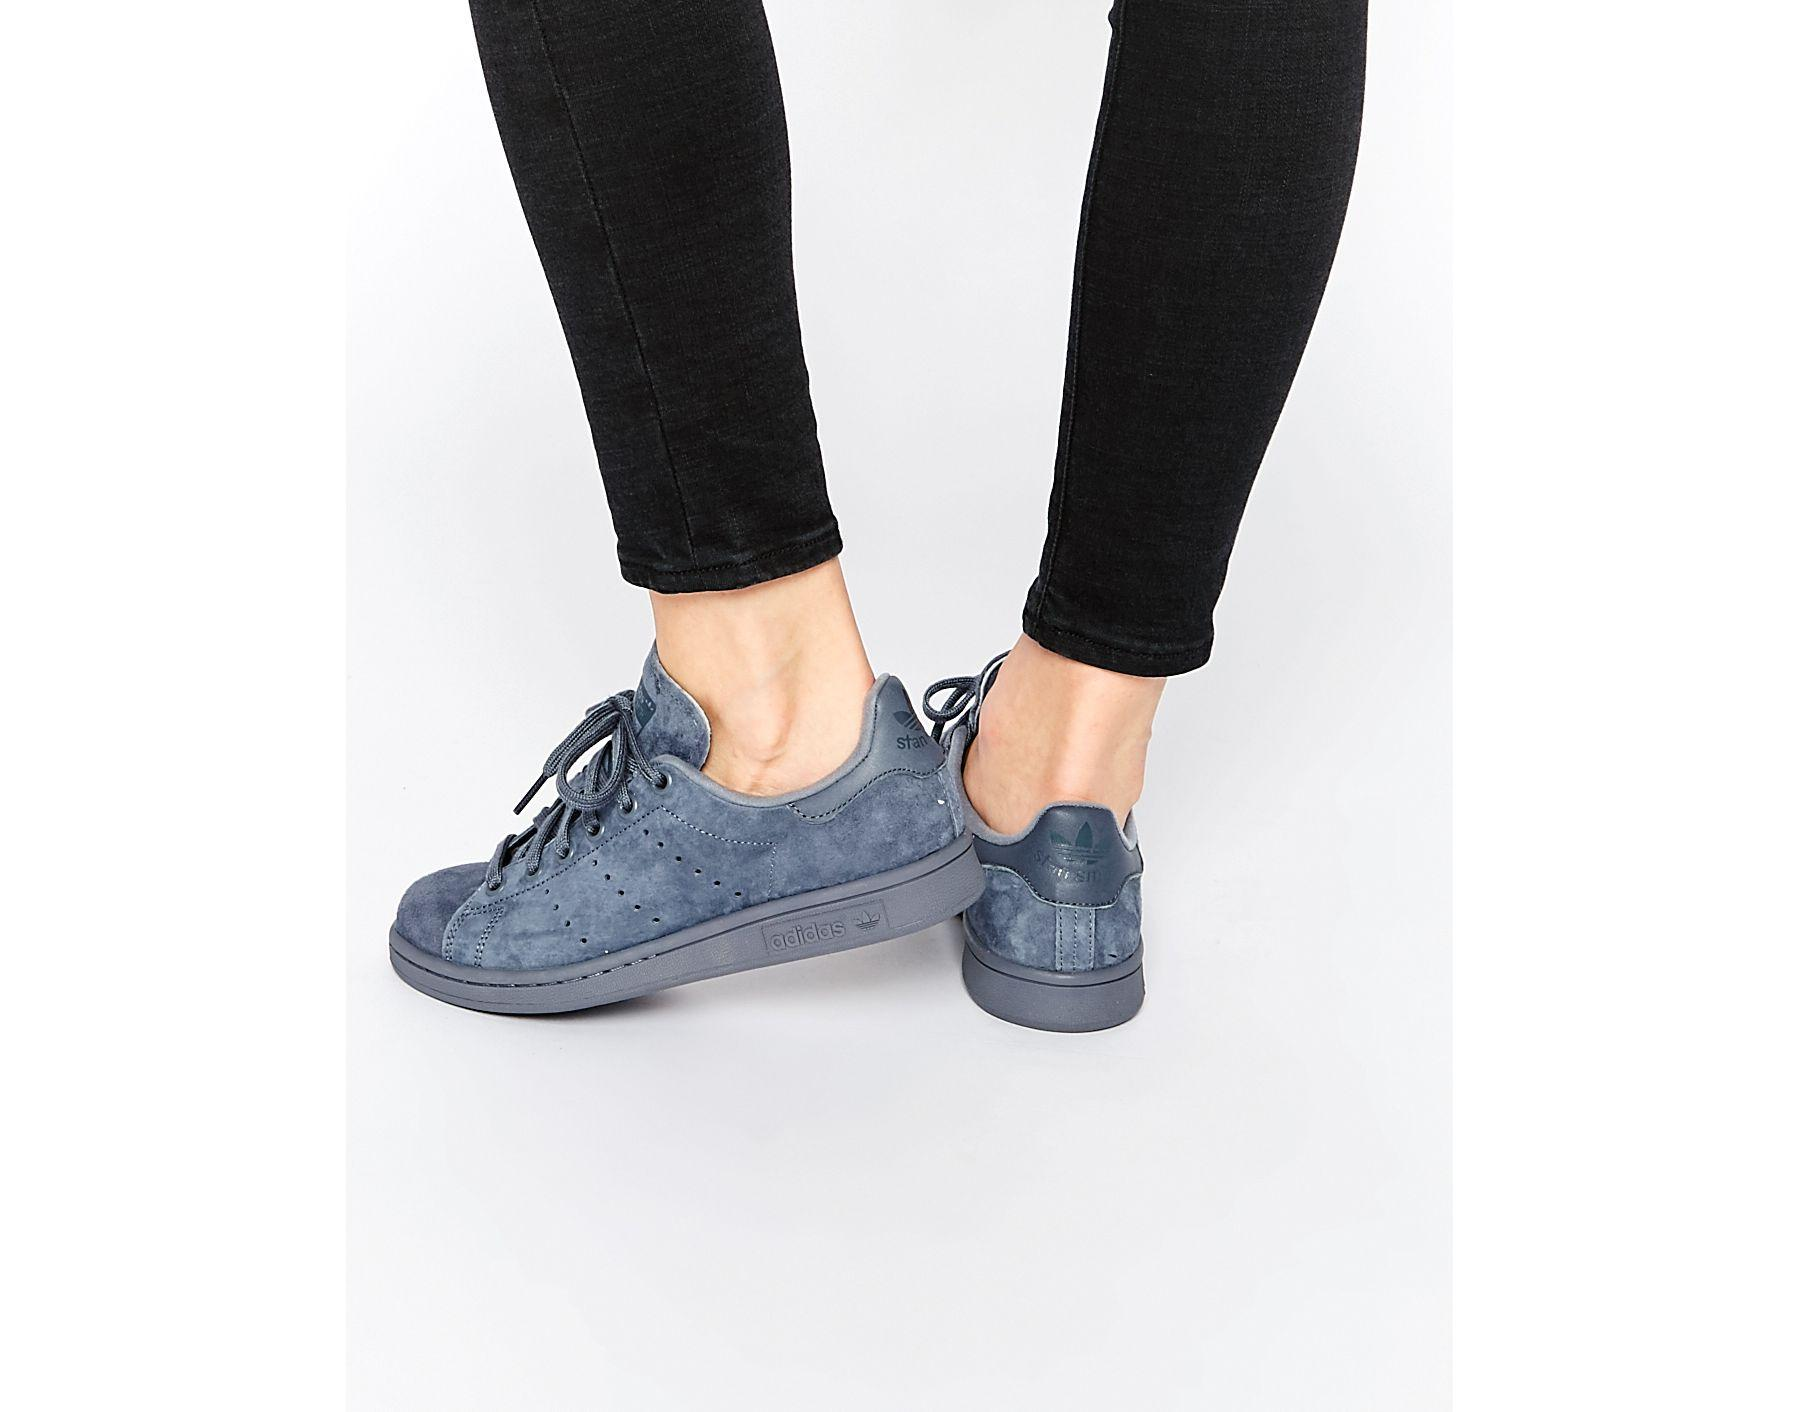 5c6689a28 adidas Originals Originals Onix Stan Smith Sneakers in Blue - Lyst